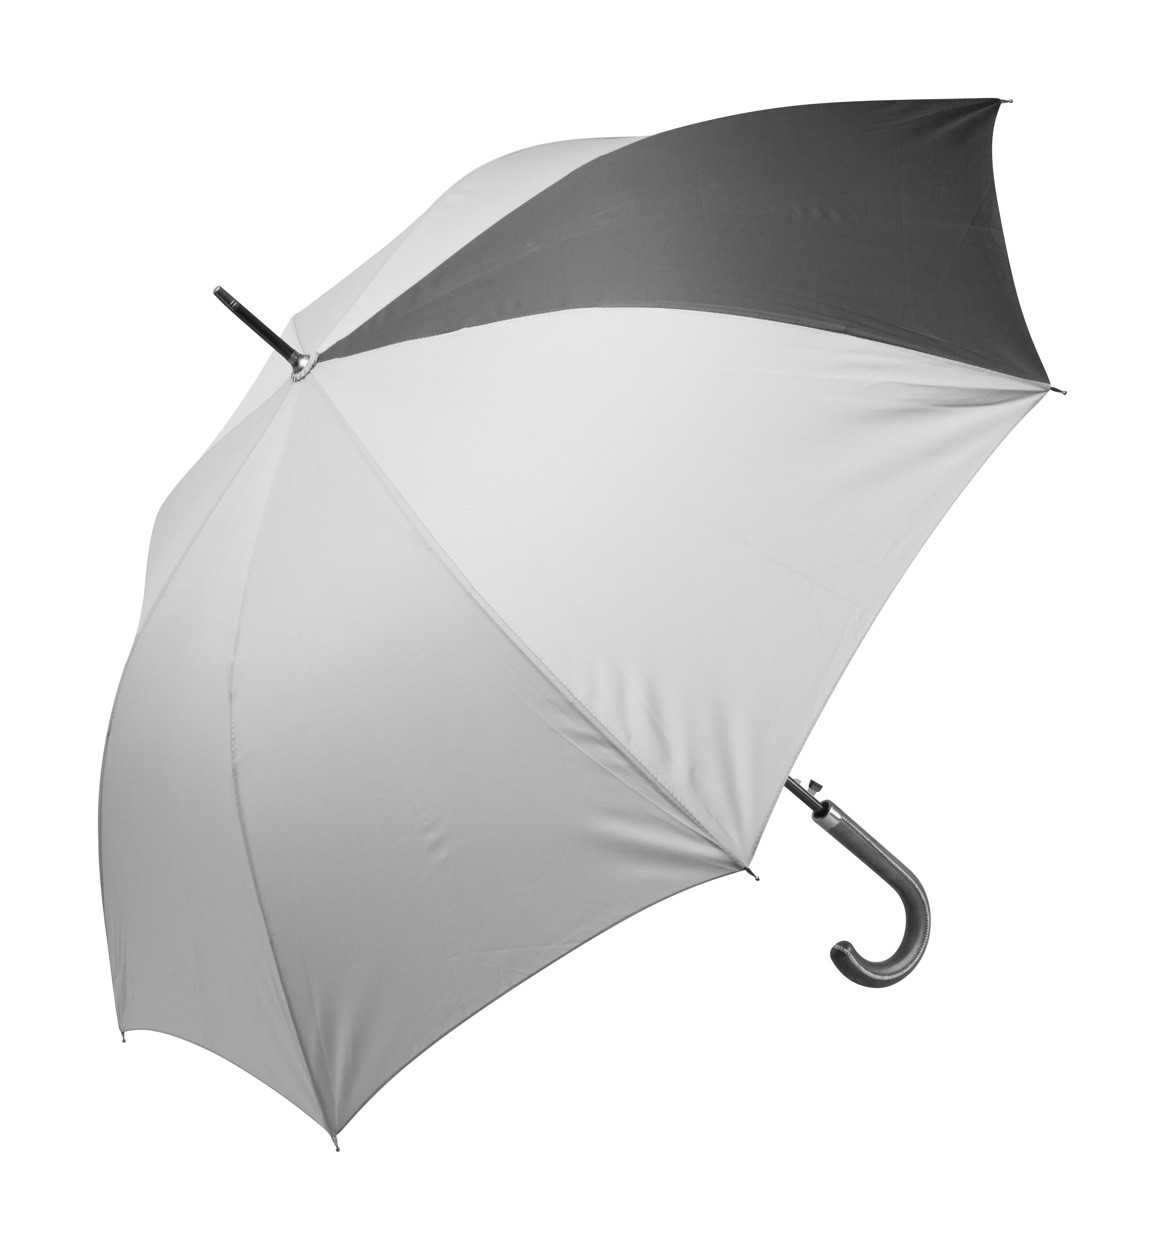 Deštník Stratus - Šedá / Černá